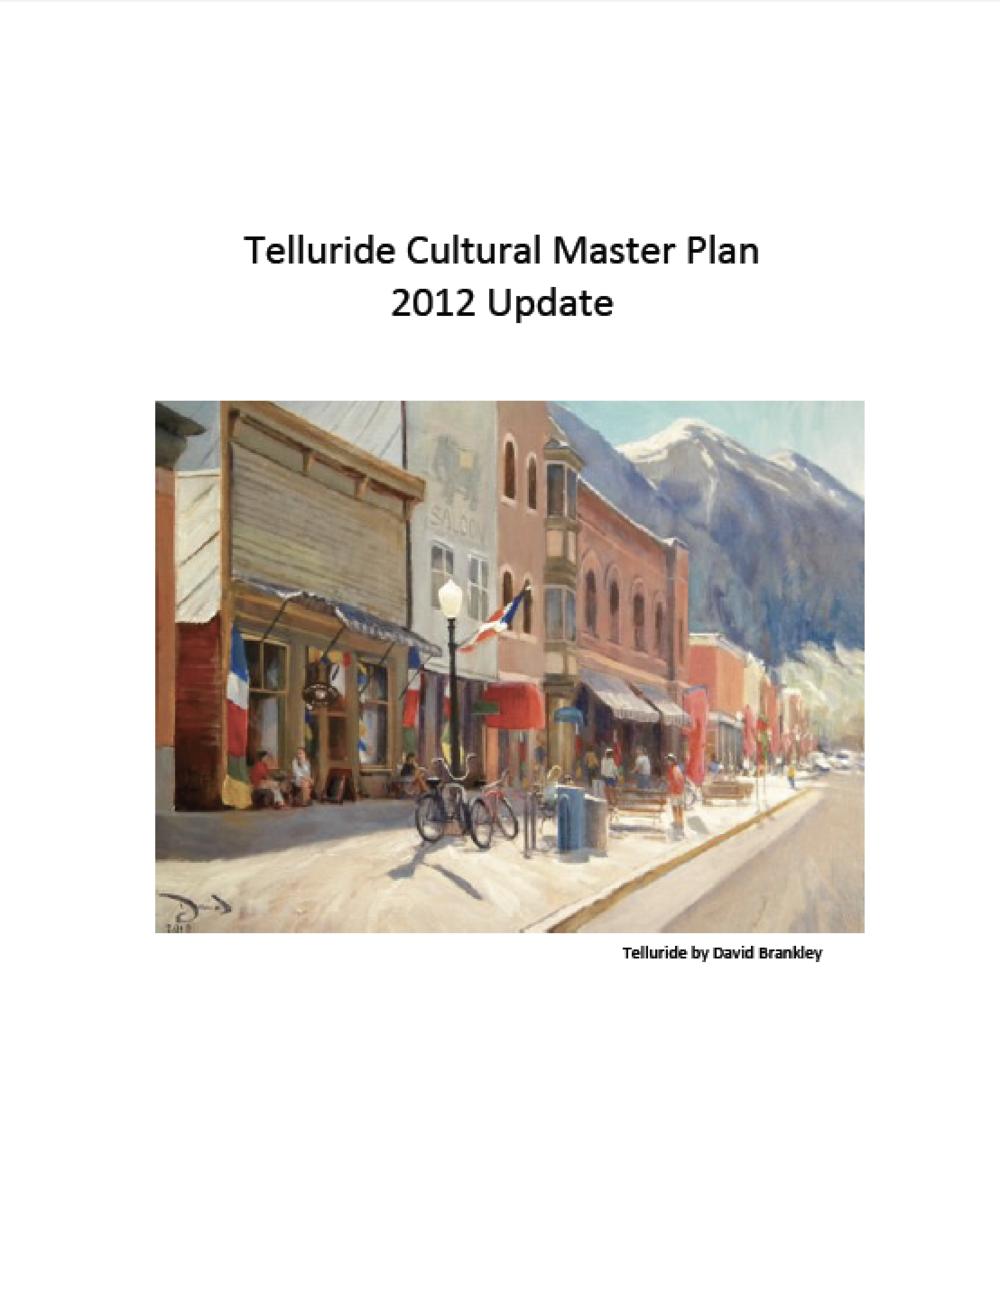 Community Benchmark: Telluride